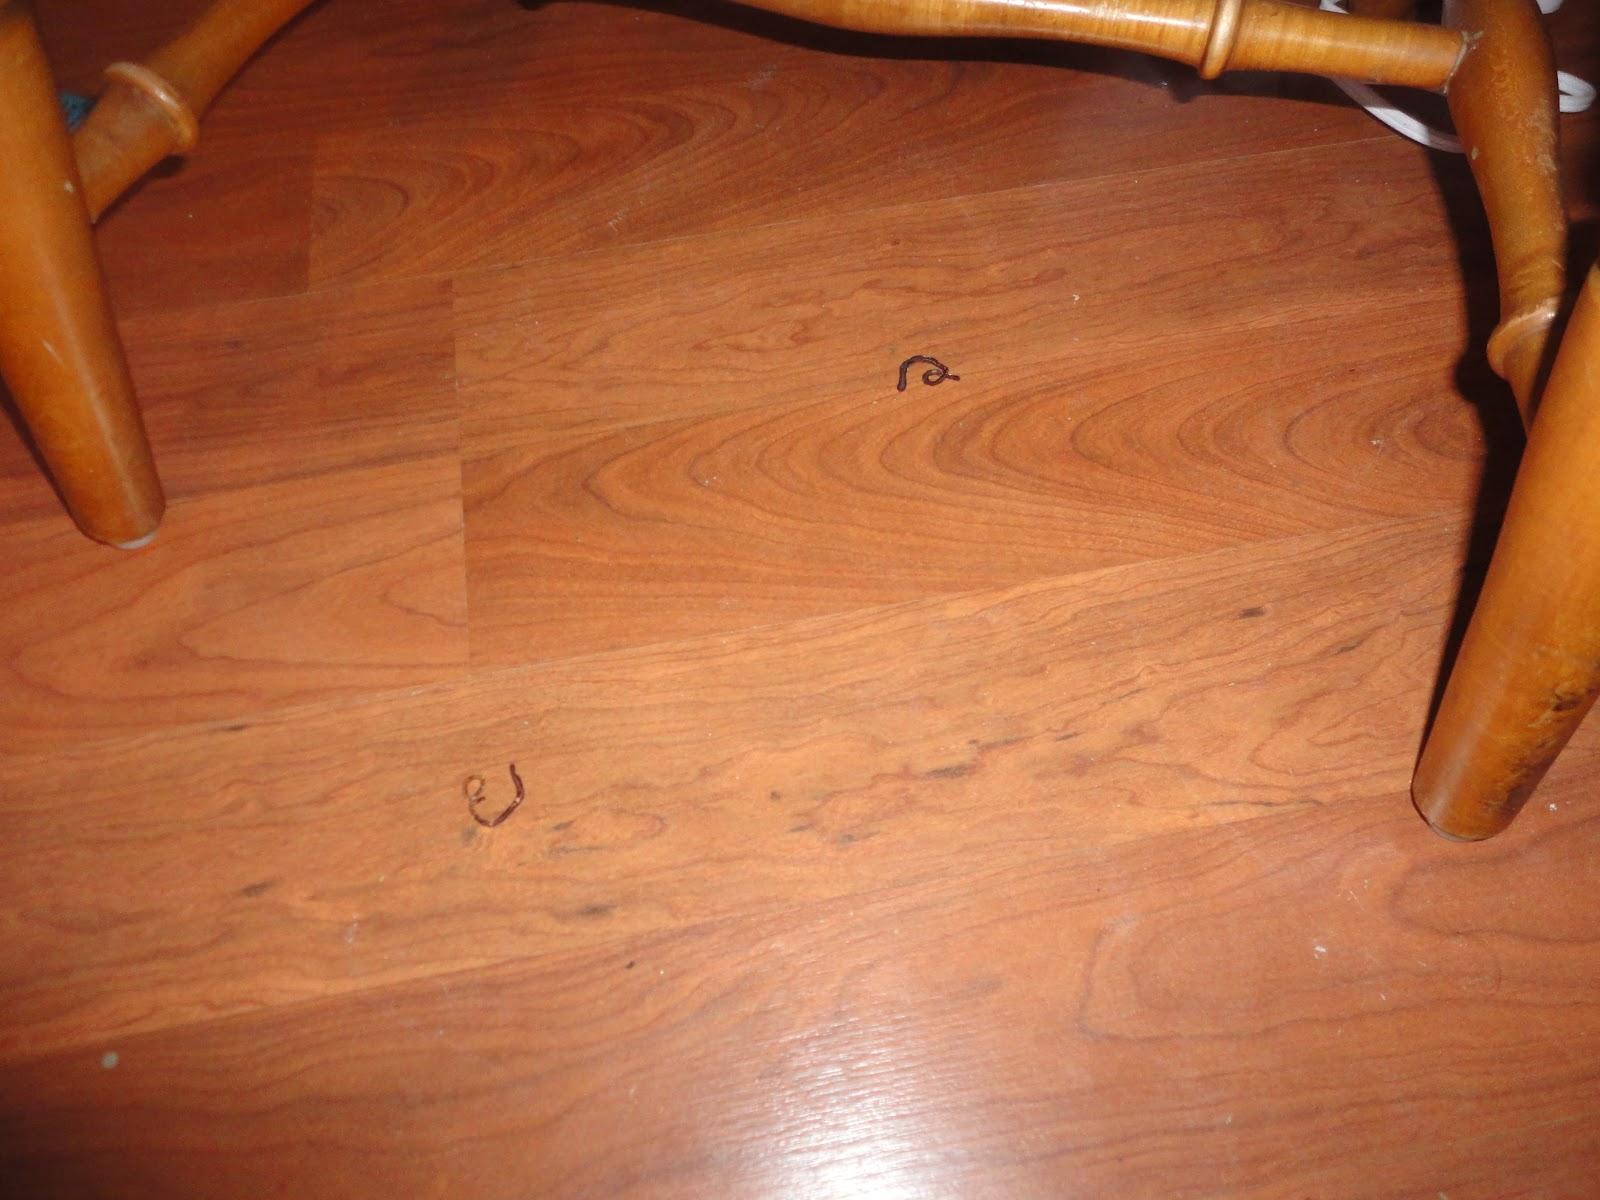 Maggots On Kitchen Floor Similiar Maggots On Floor Keywords